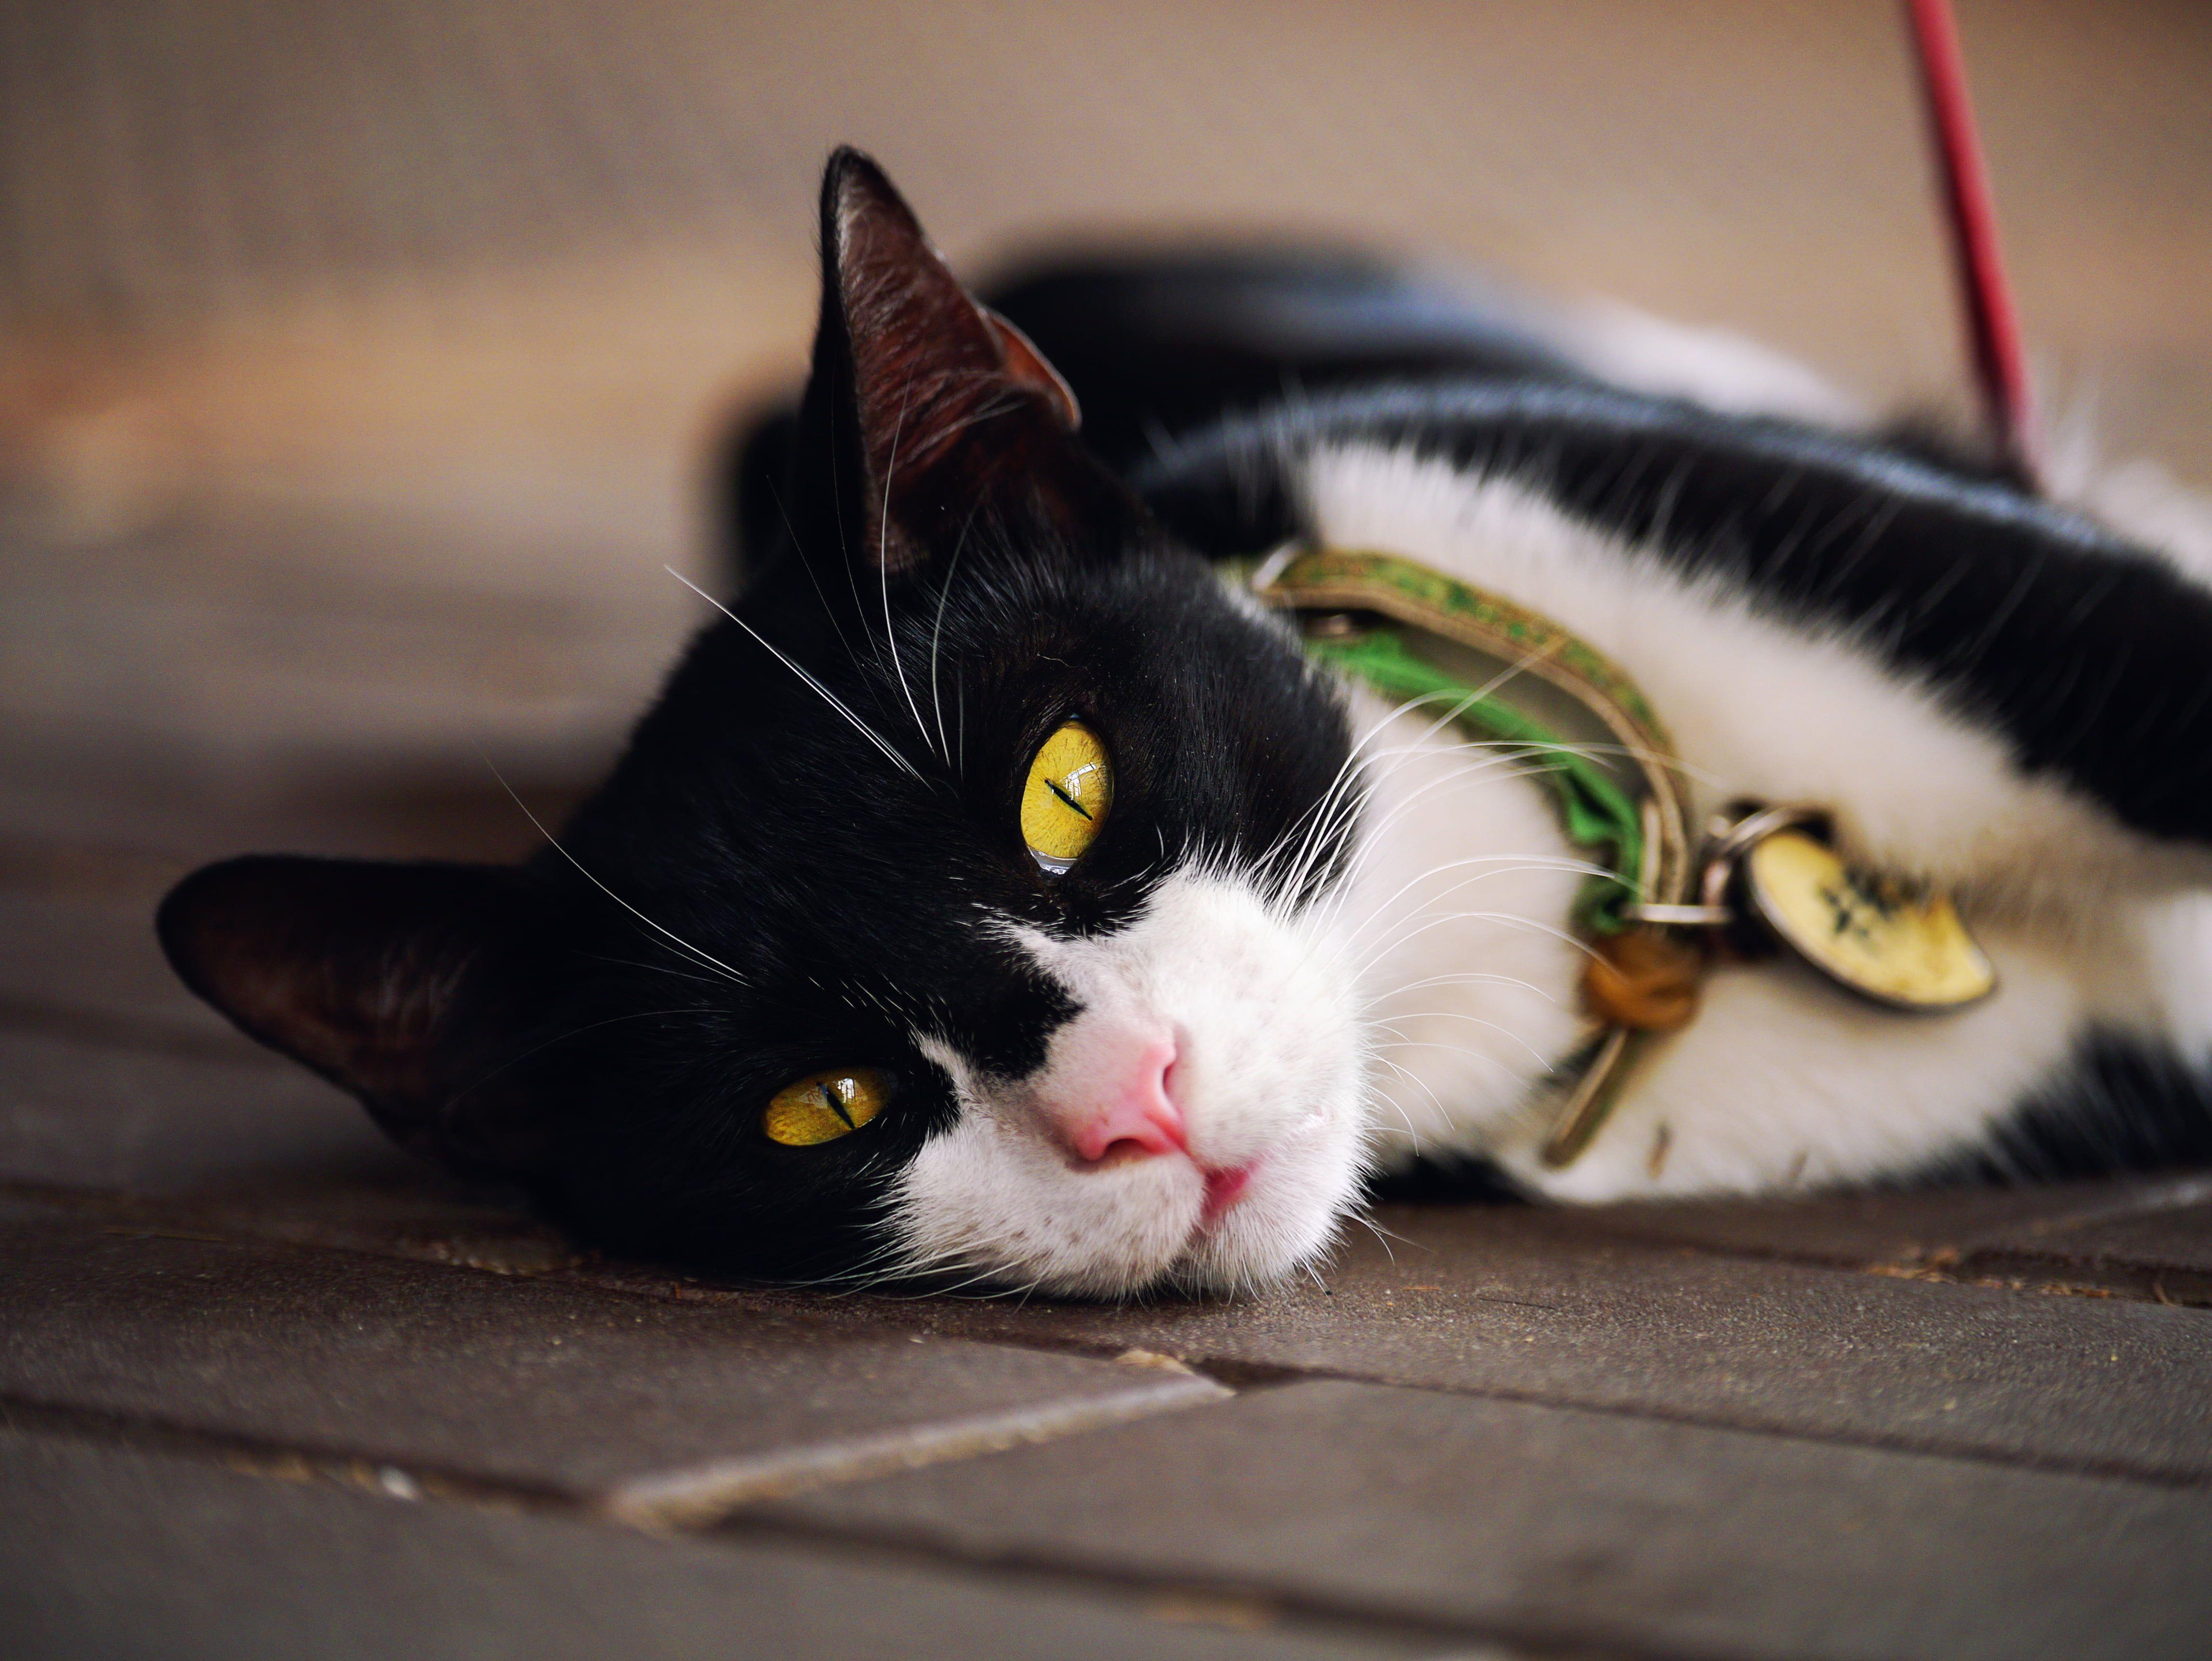 Black And White Fur Cat Lying On Floor Black And White Fur Cat Floor Gx1 Lumix Panasonic Domestic Ca In 2020 Grey Tabby Cats Silver Tabby Cat Silver Tabby Kitten